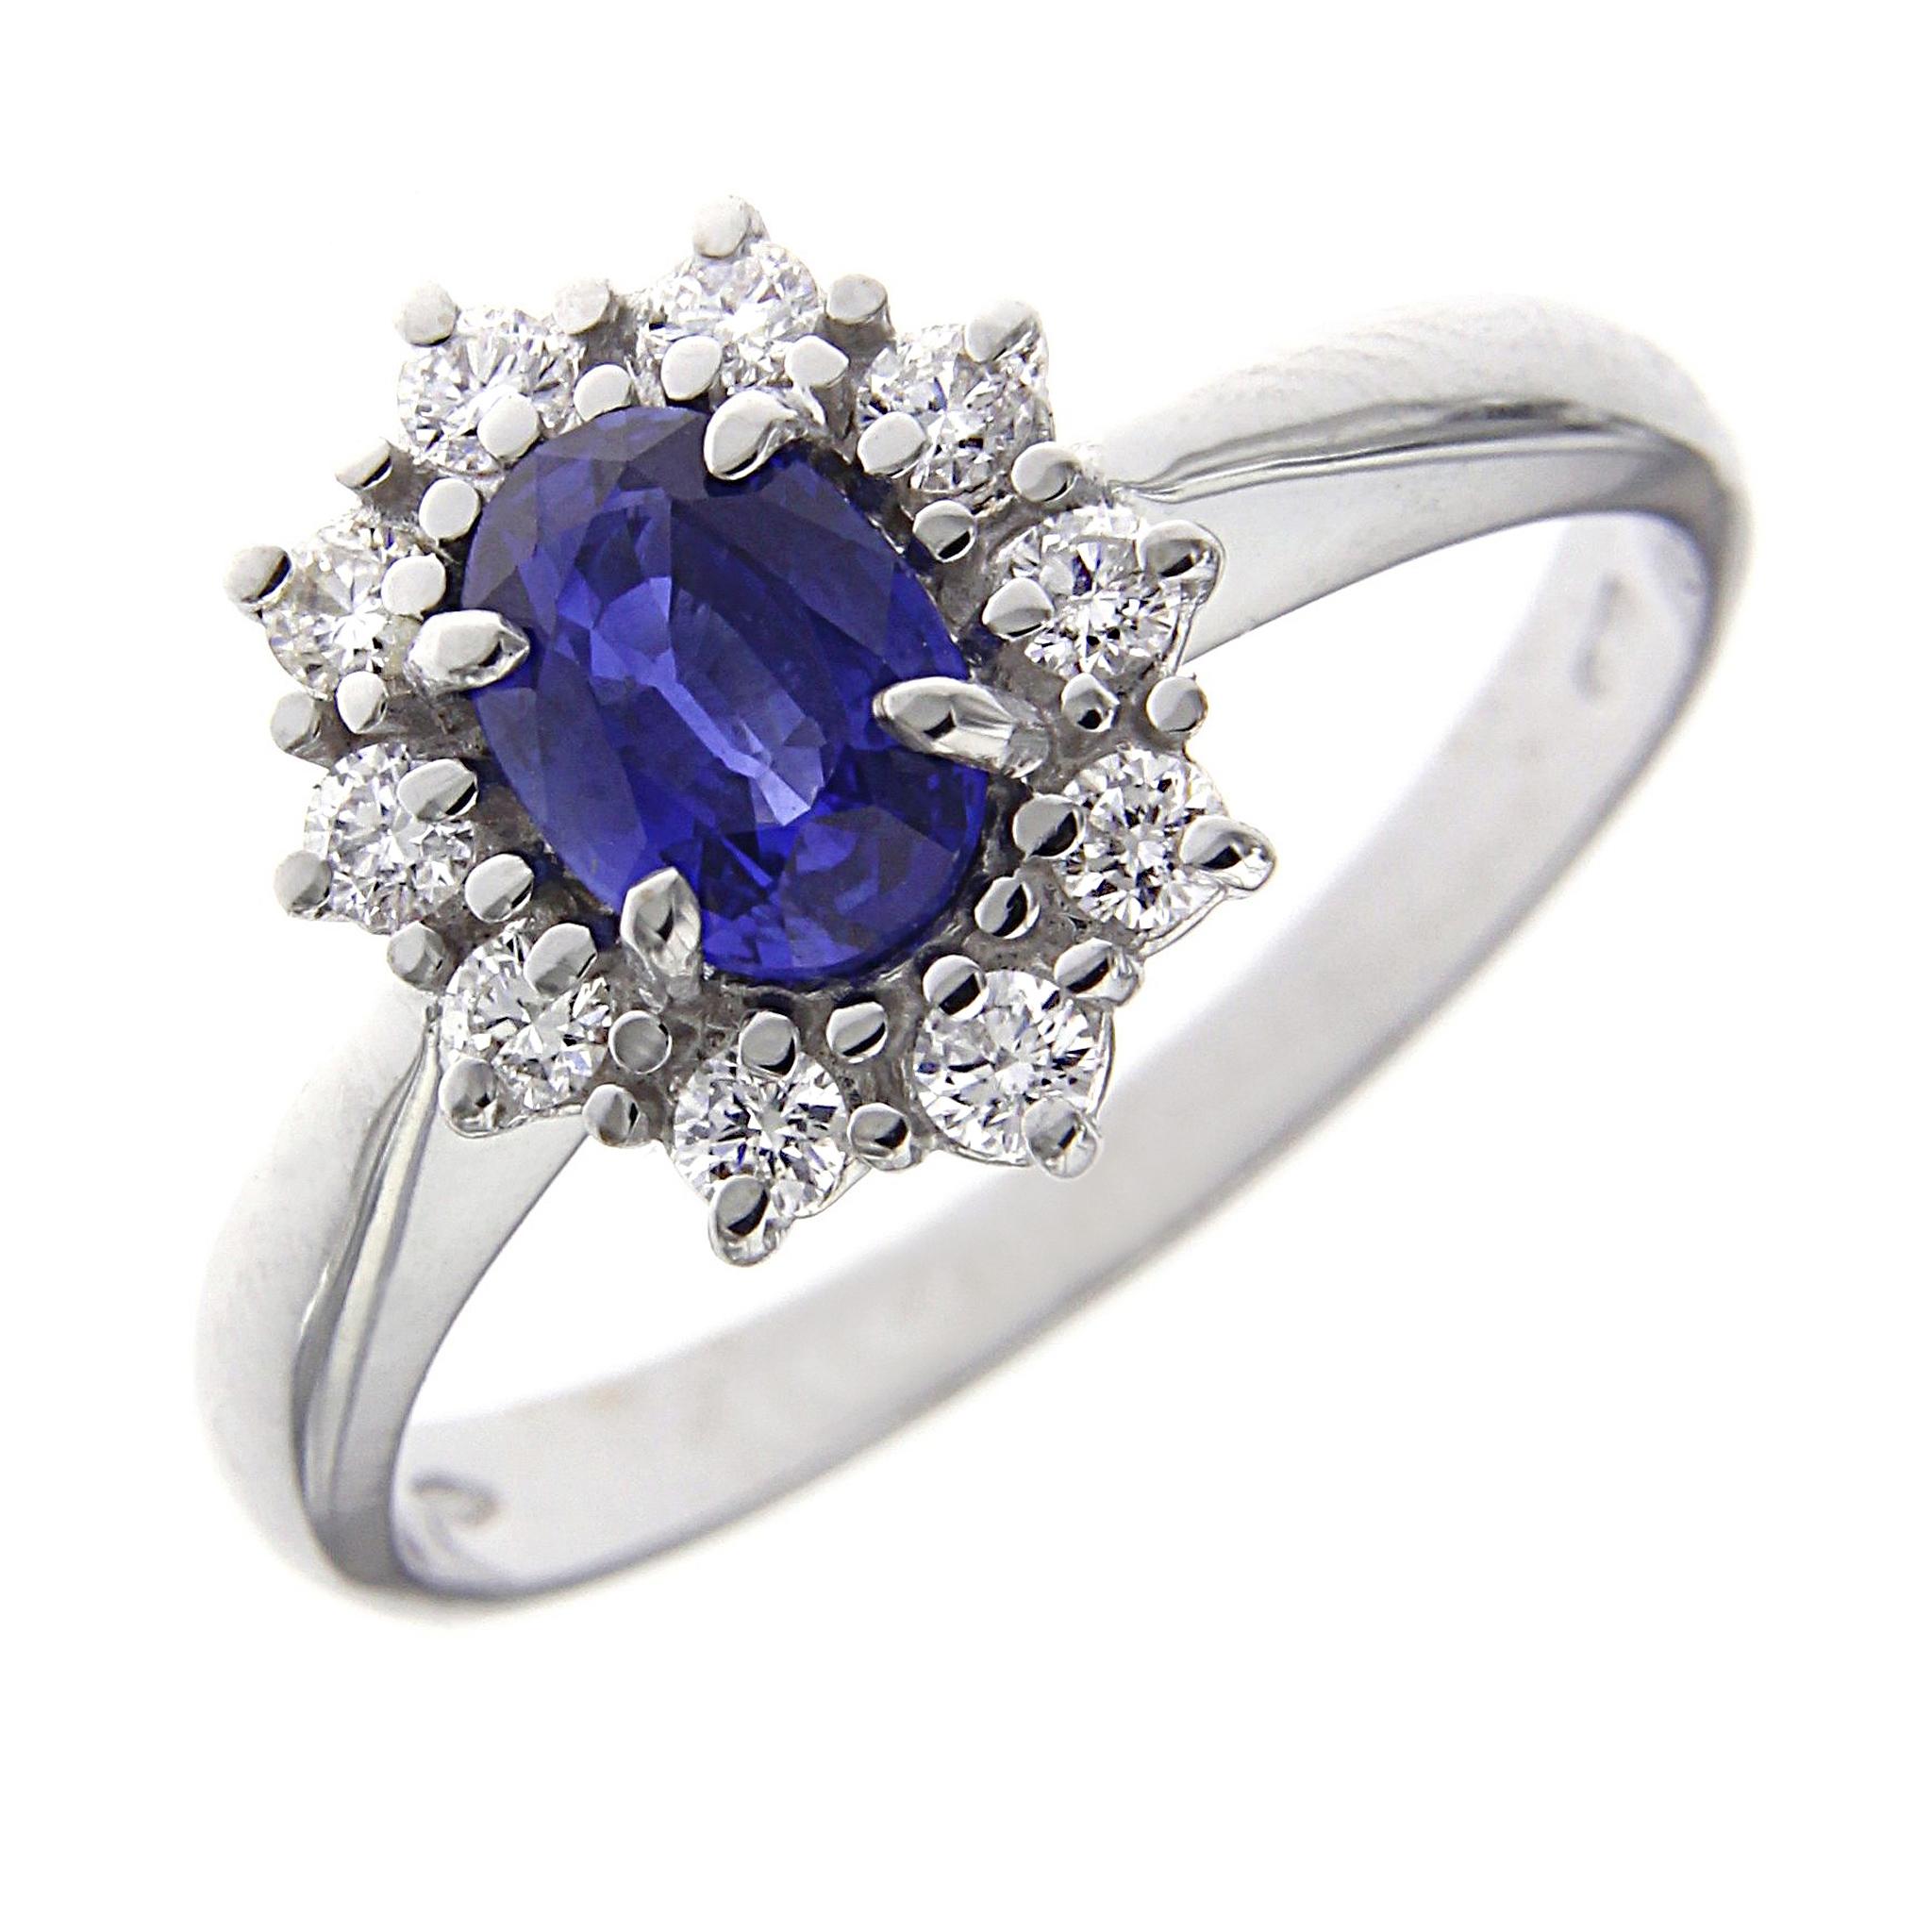 nuovo concetto b70b1 3aab3 Anello zaffiro e diamanti Linea Katia